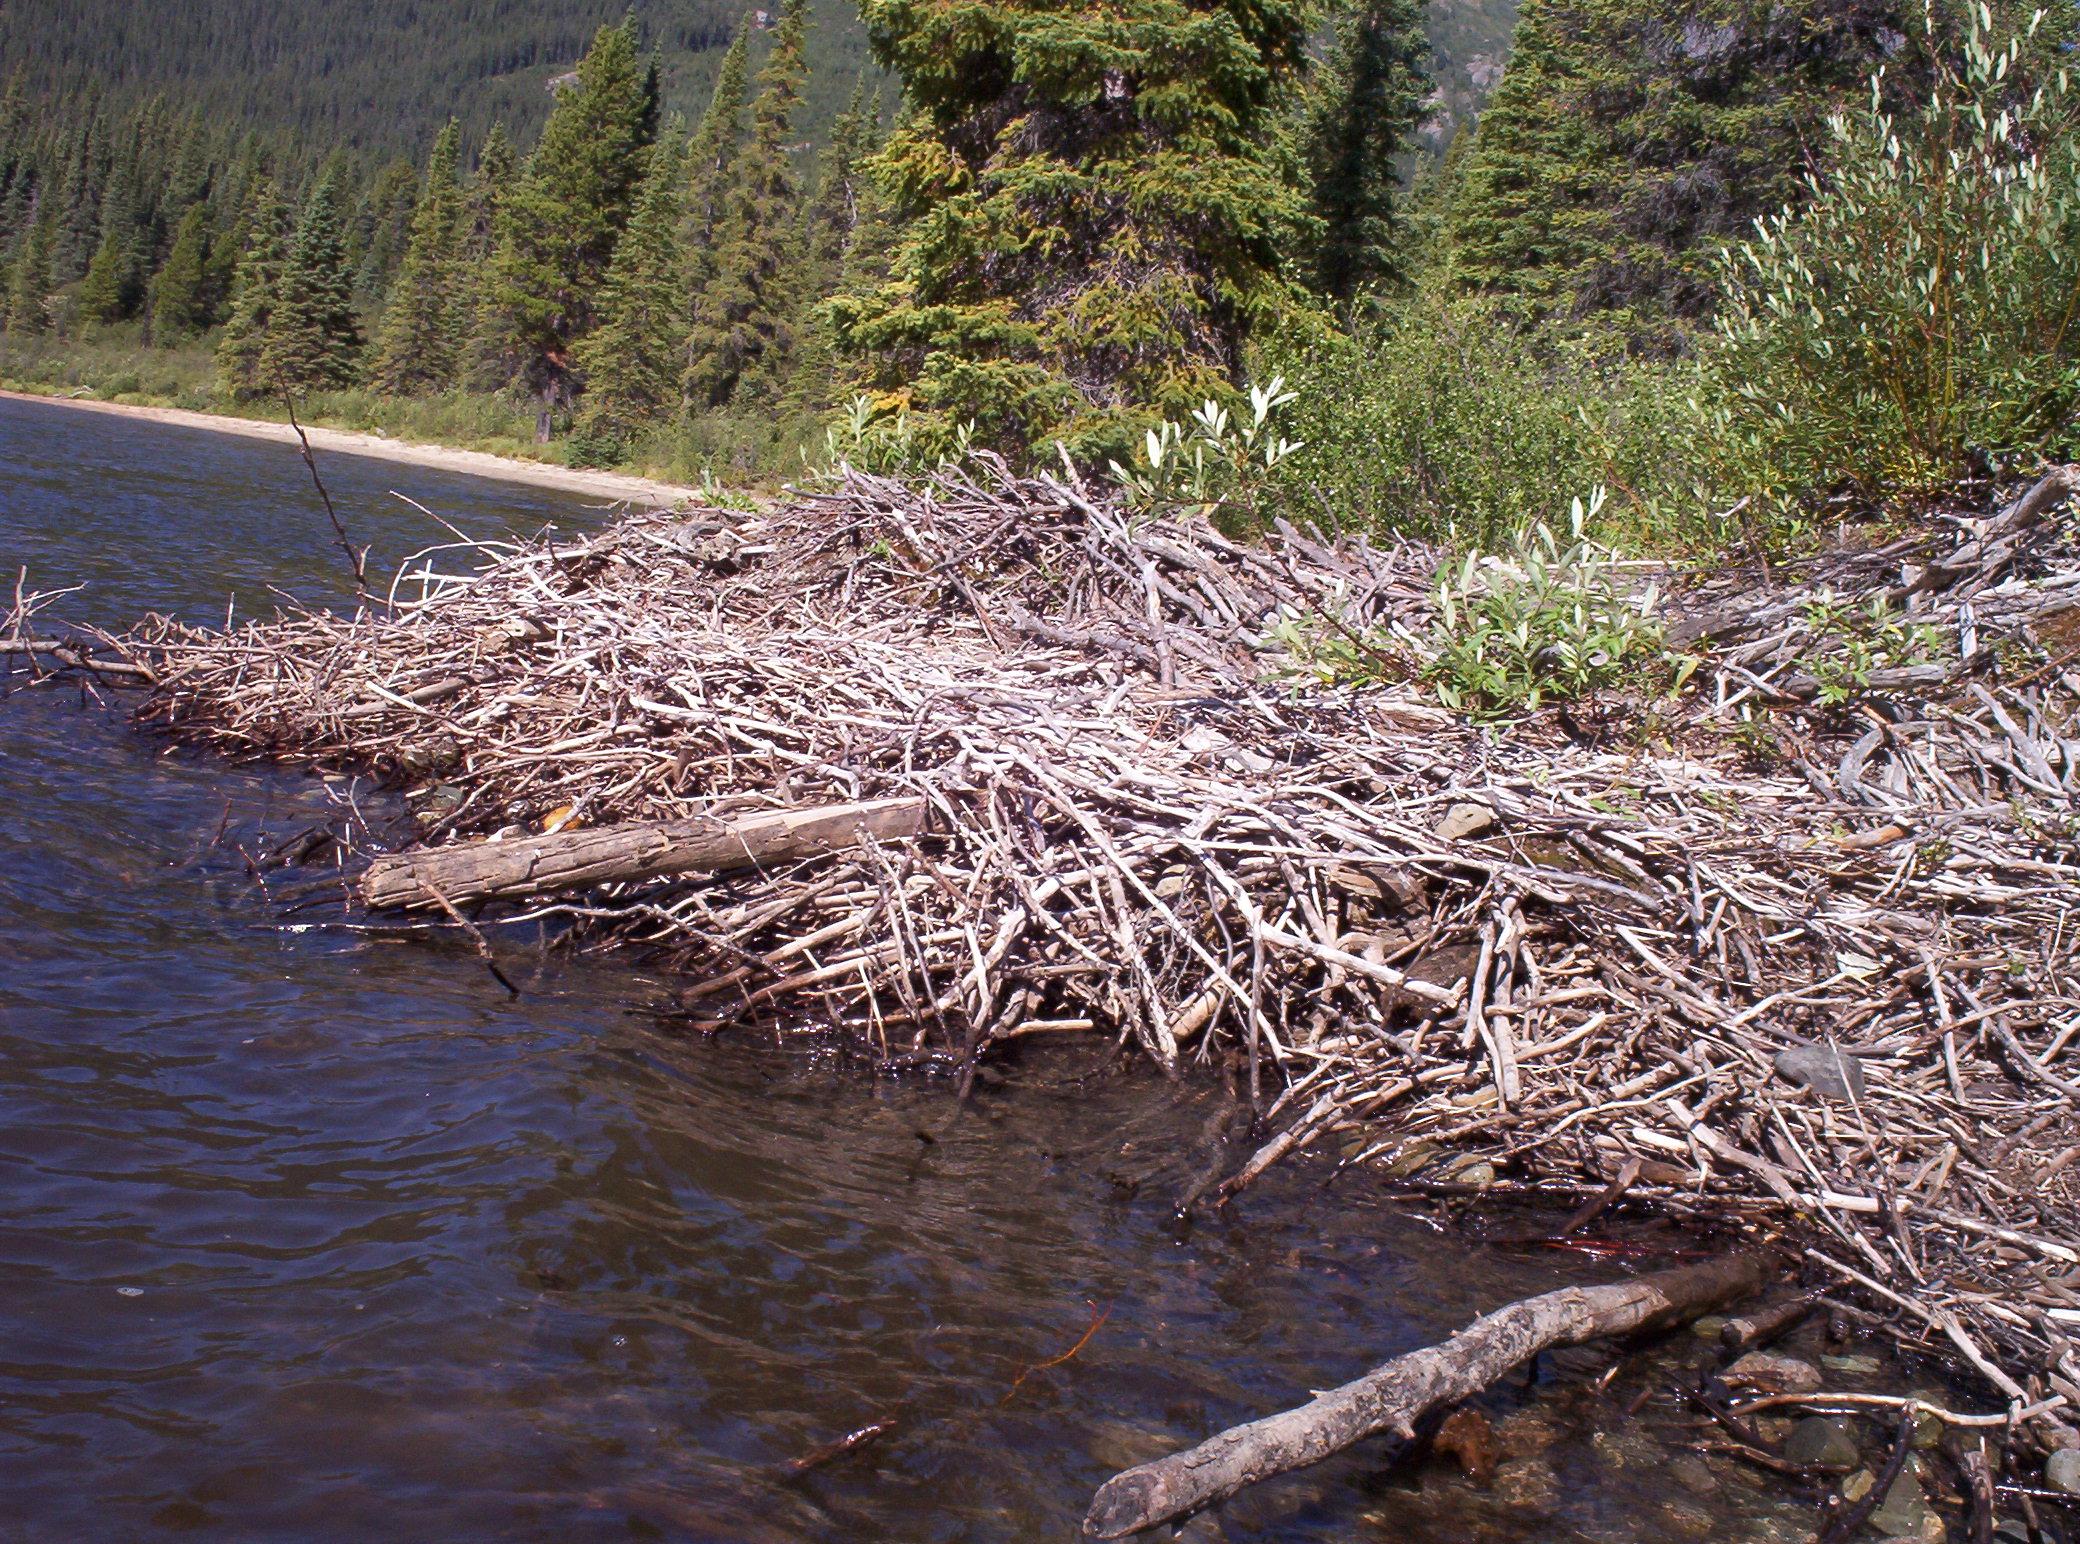 Copy of Beaver dam, Denetiah Provincial Park